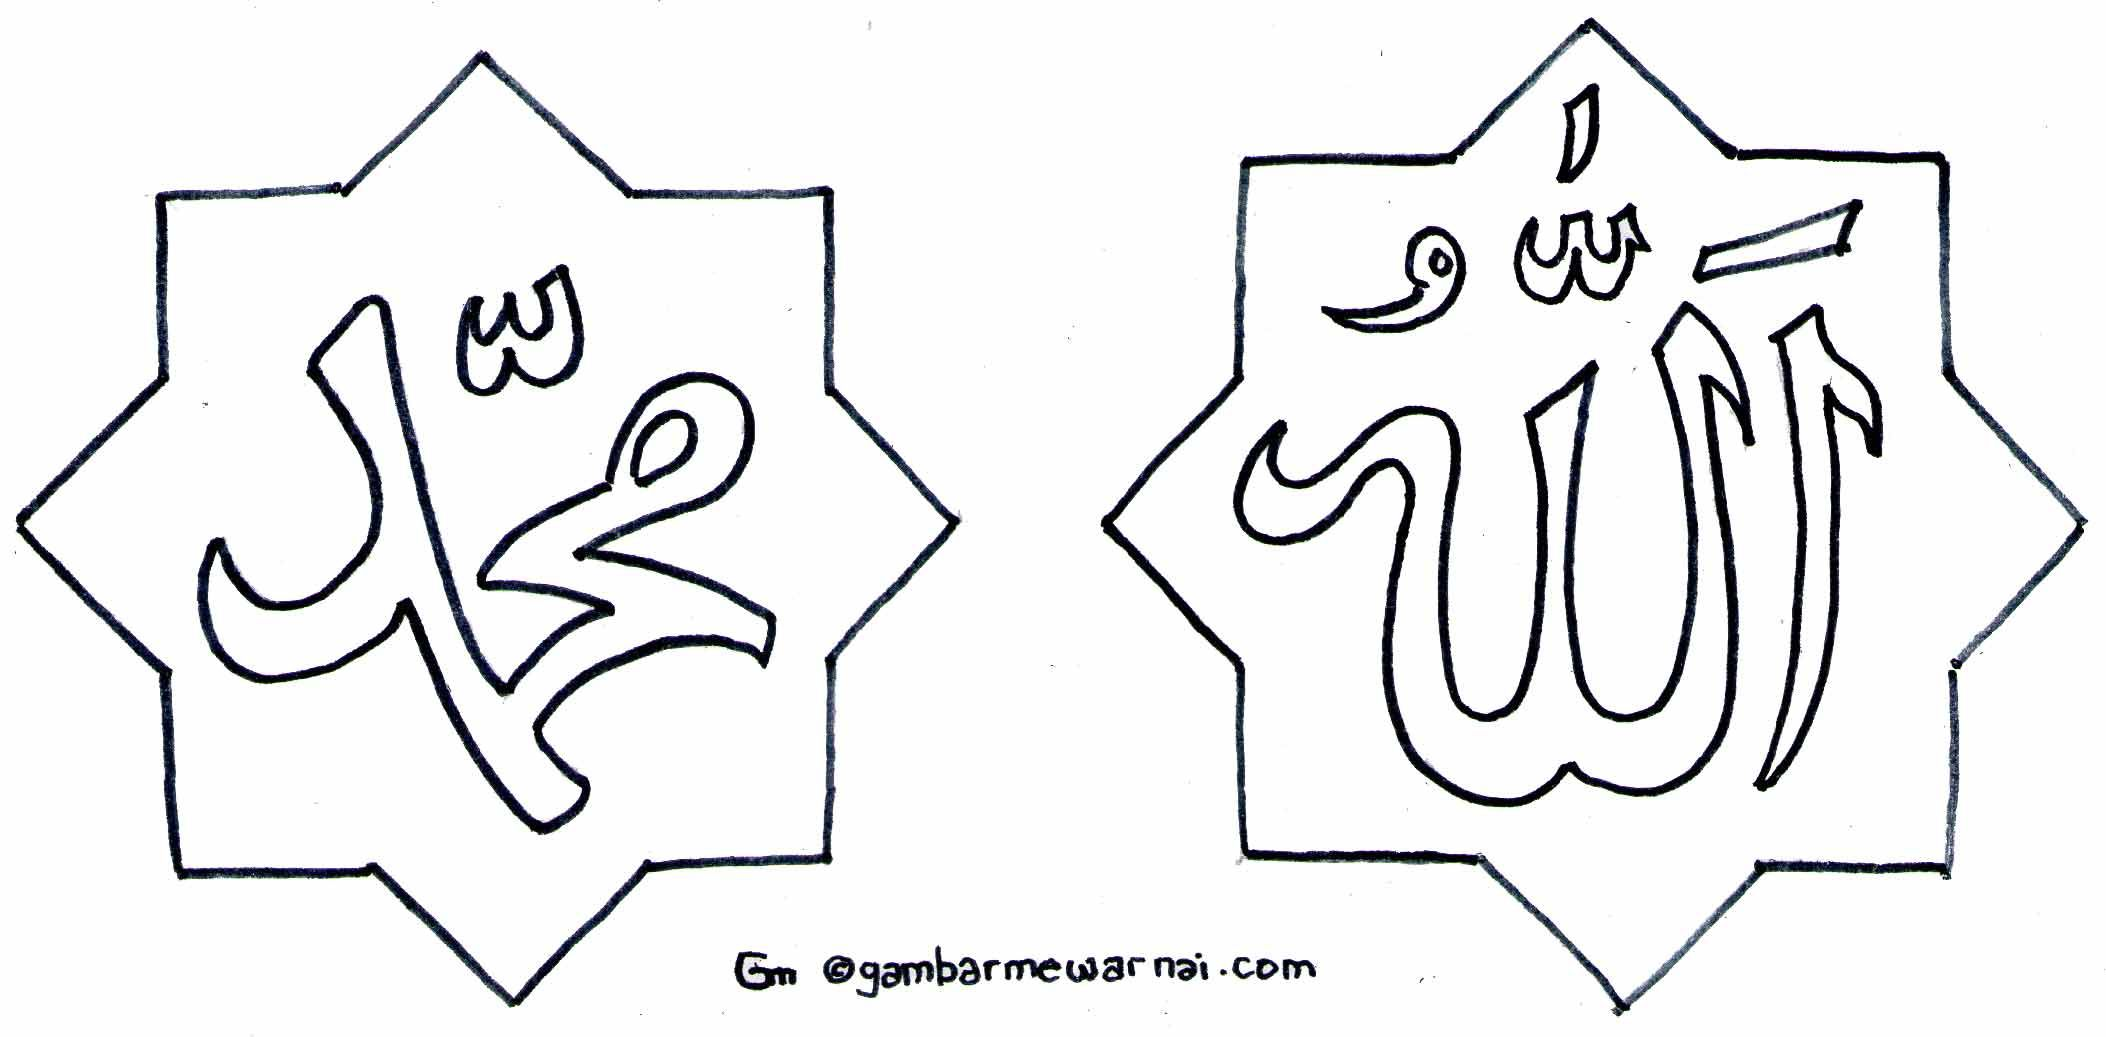 Gambar Mewarnai Kaligrafi AllahMuhammad Allah Muhammad